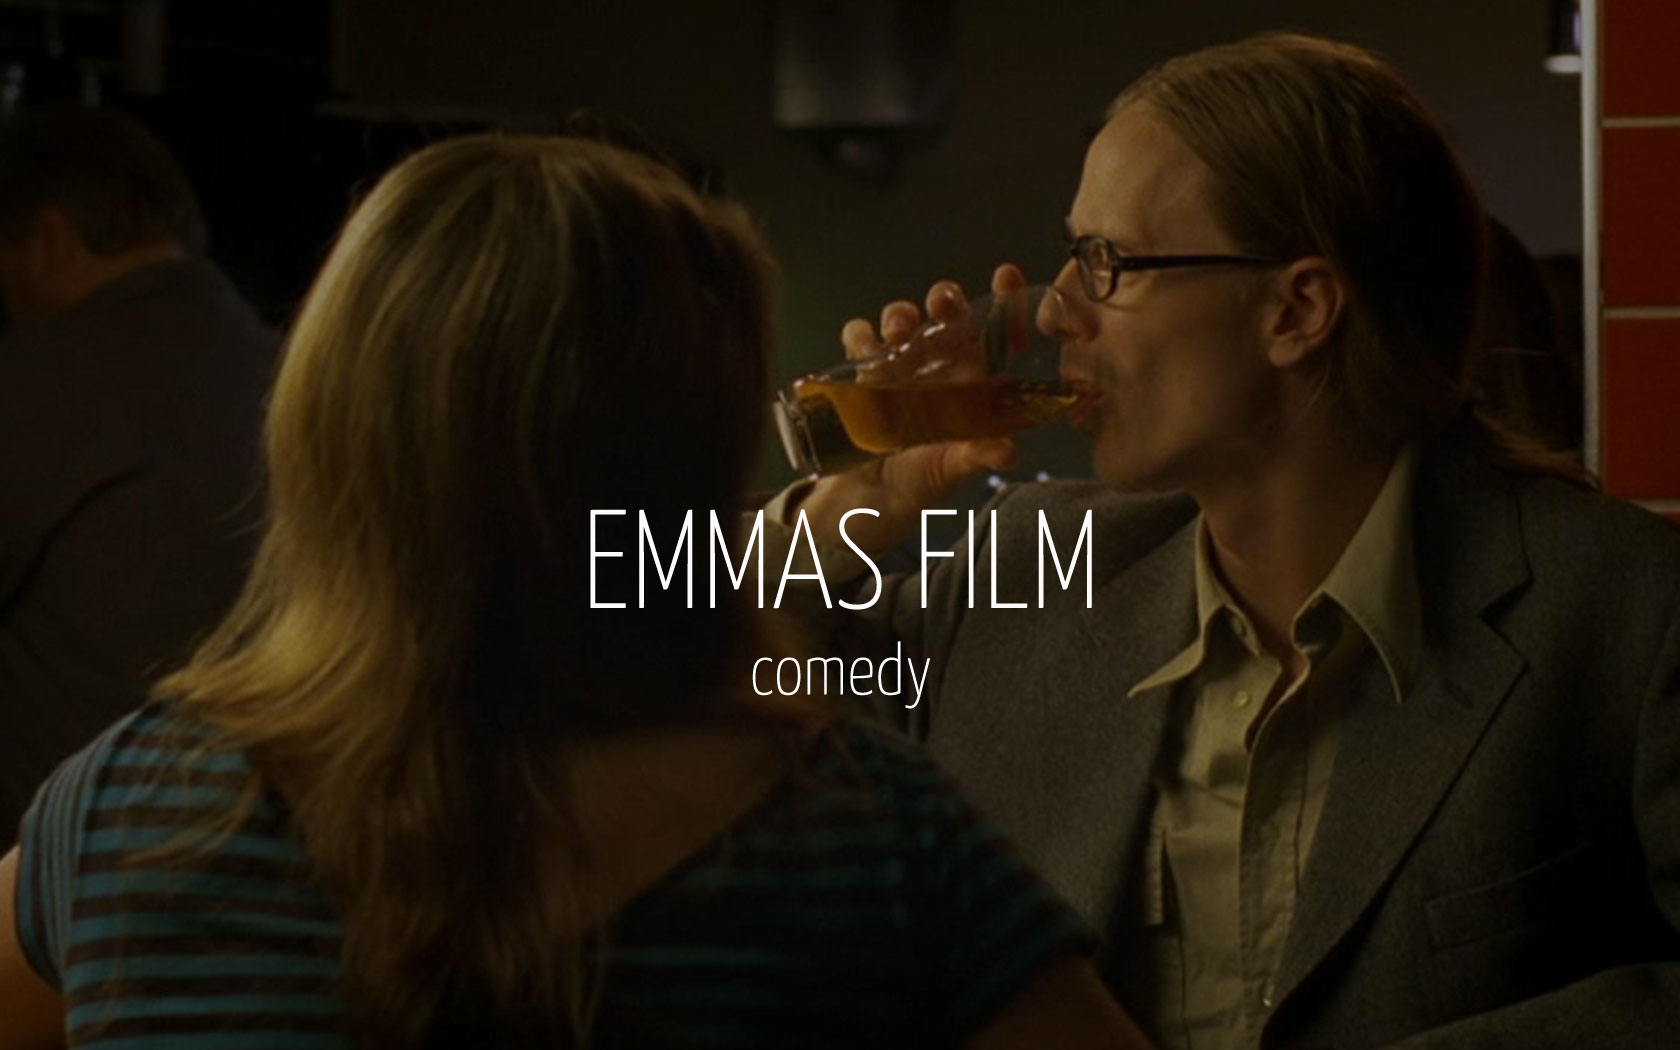 Scandinavian actor Fredrik Wagner as world of warcraft nerd in comedy film Emmas film